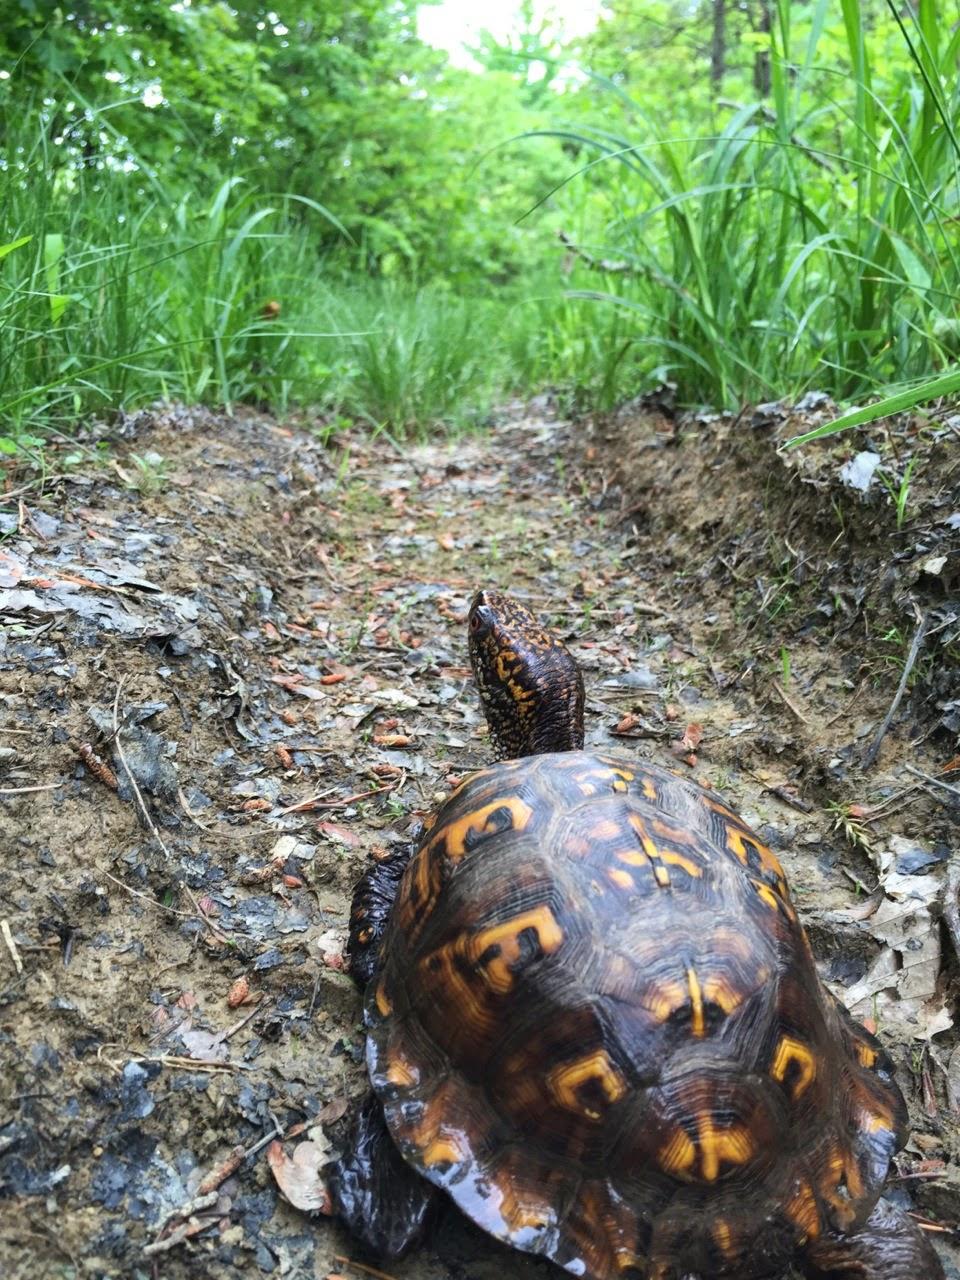 julie zickefoose on blogspot my new pet box turtle